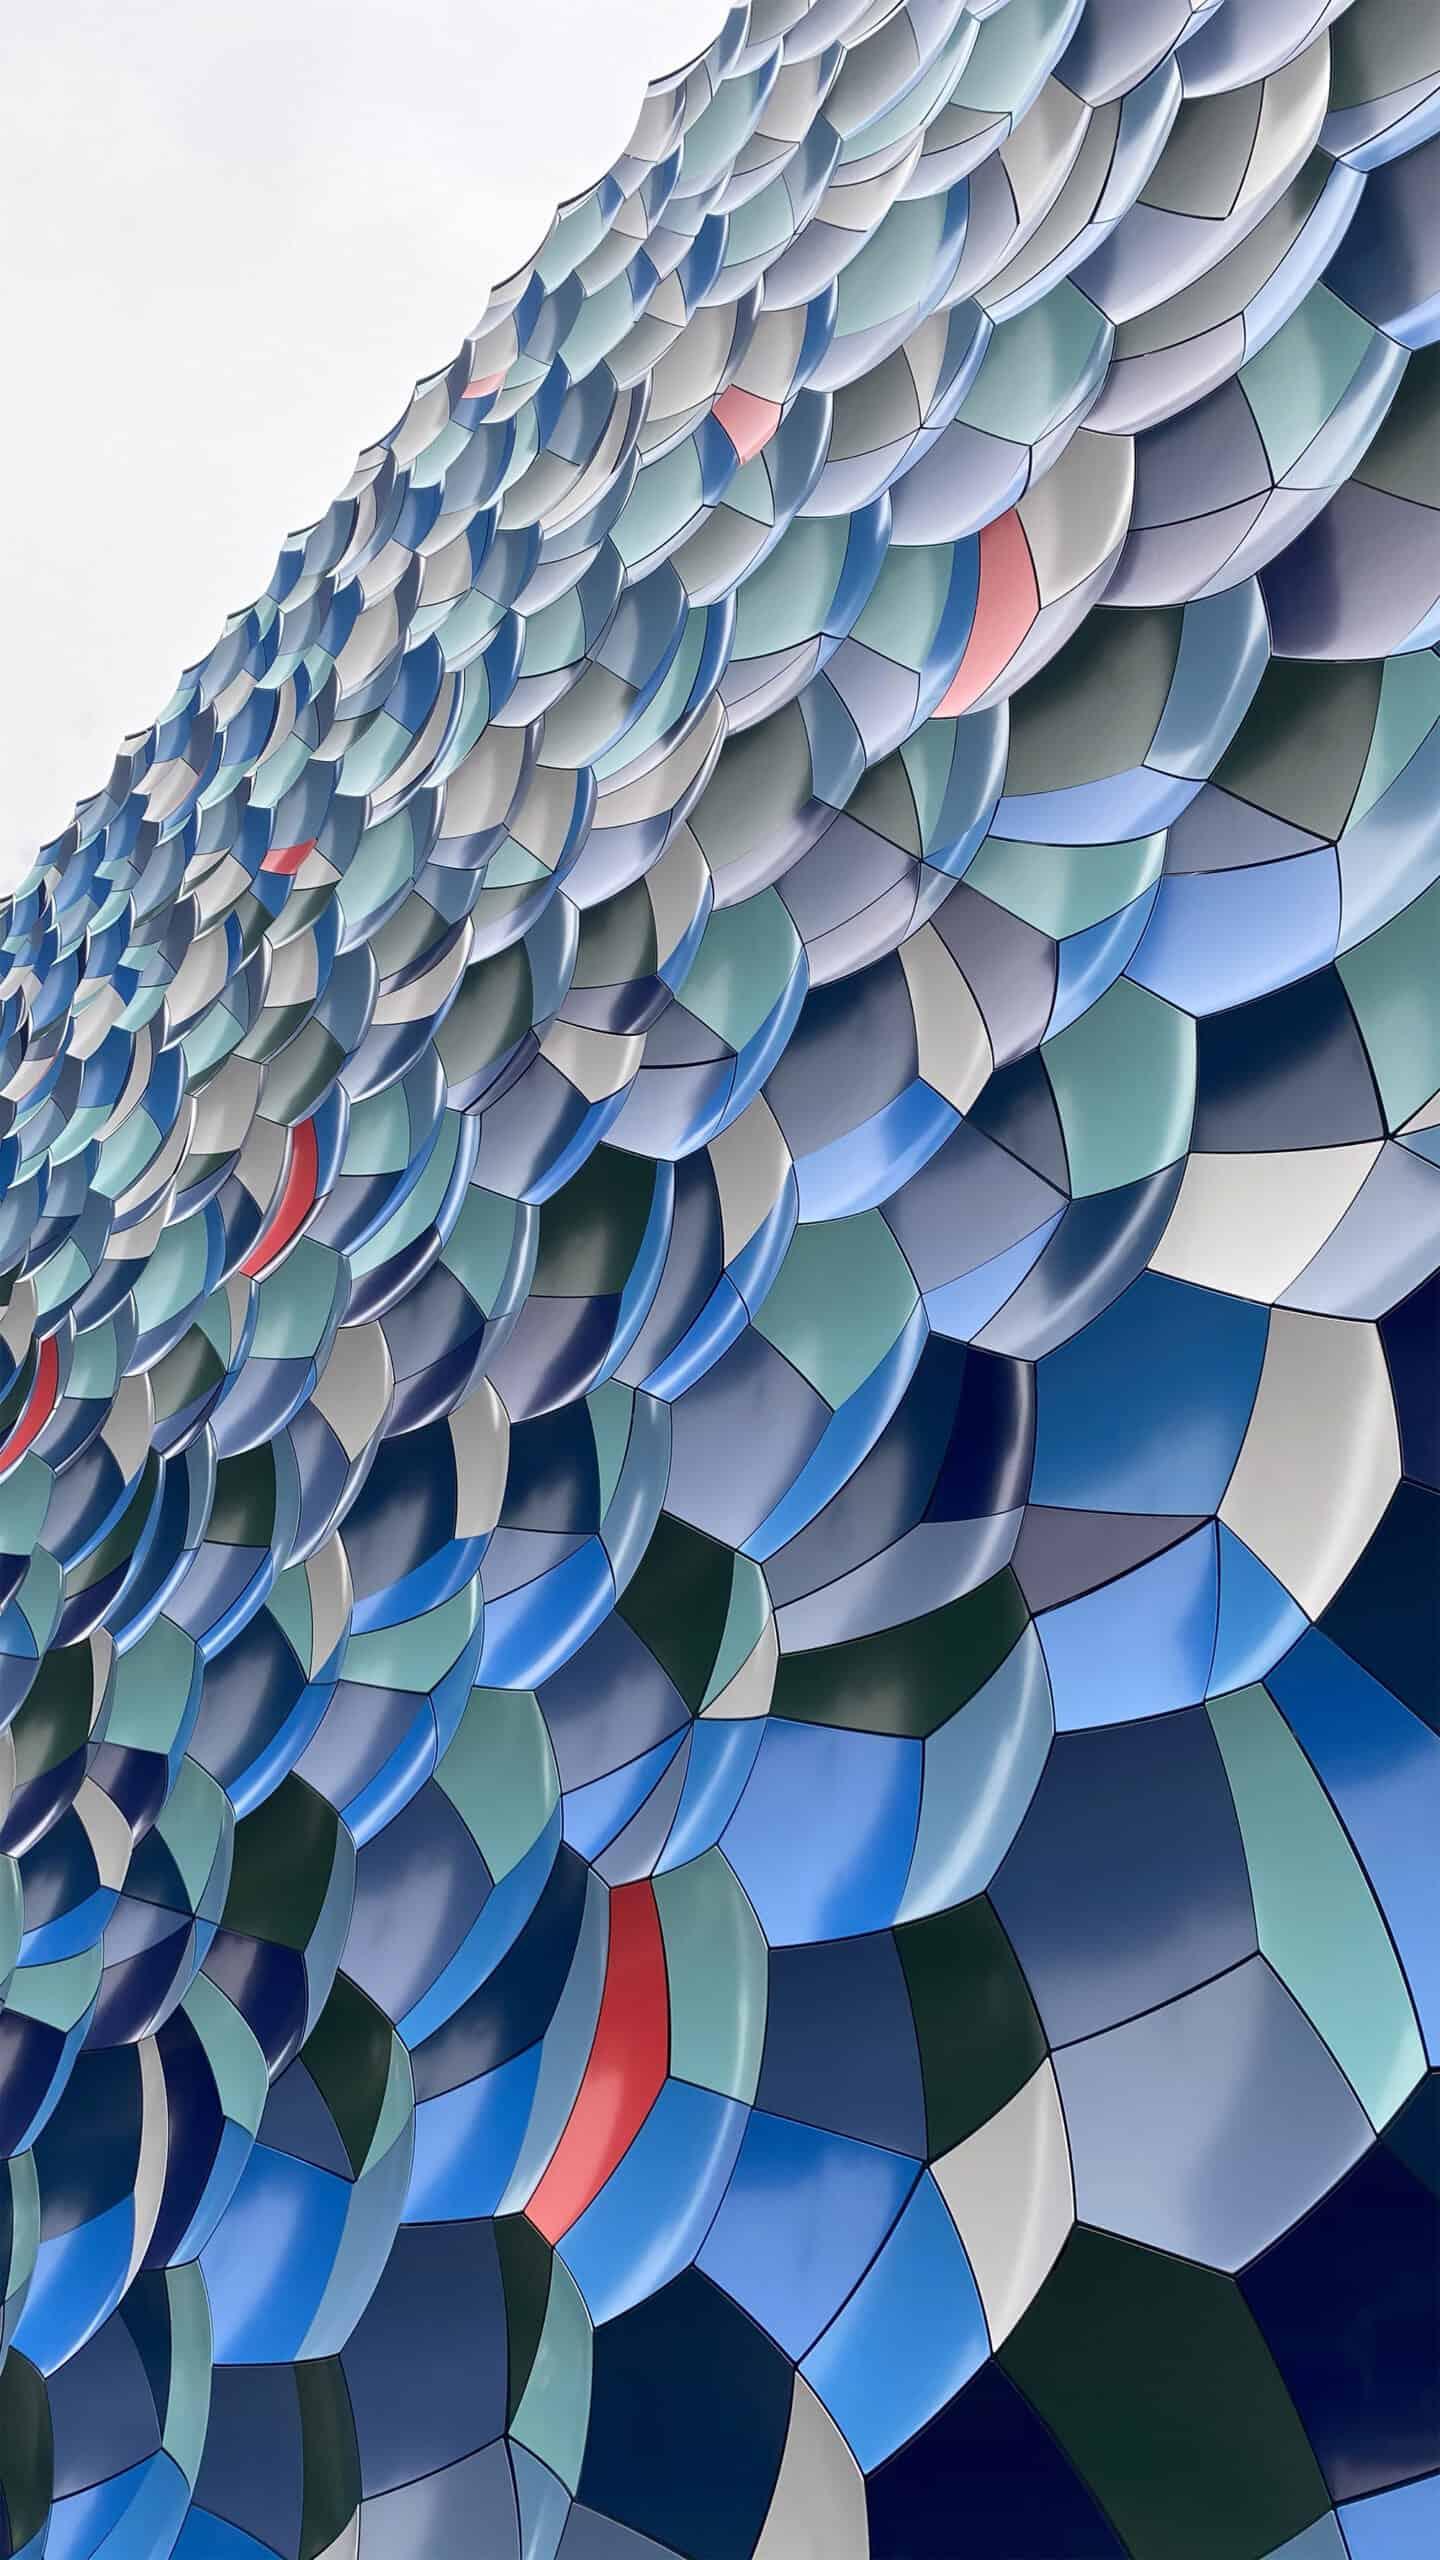 Olafur Elliason - Atmospheric wave wall